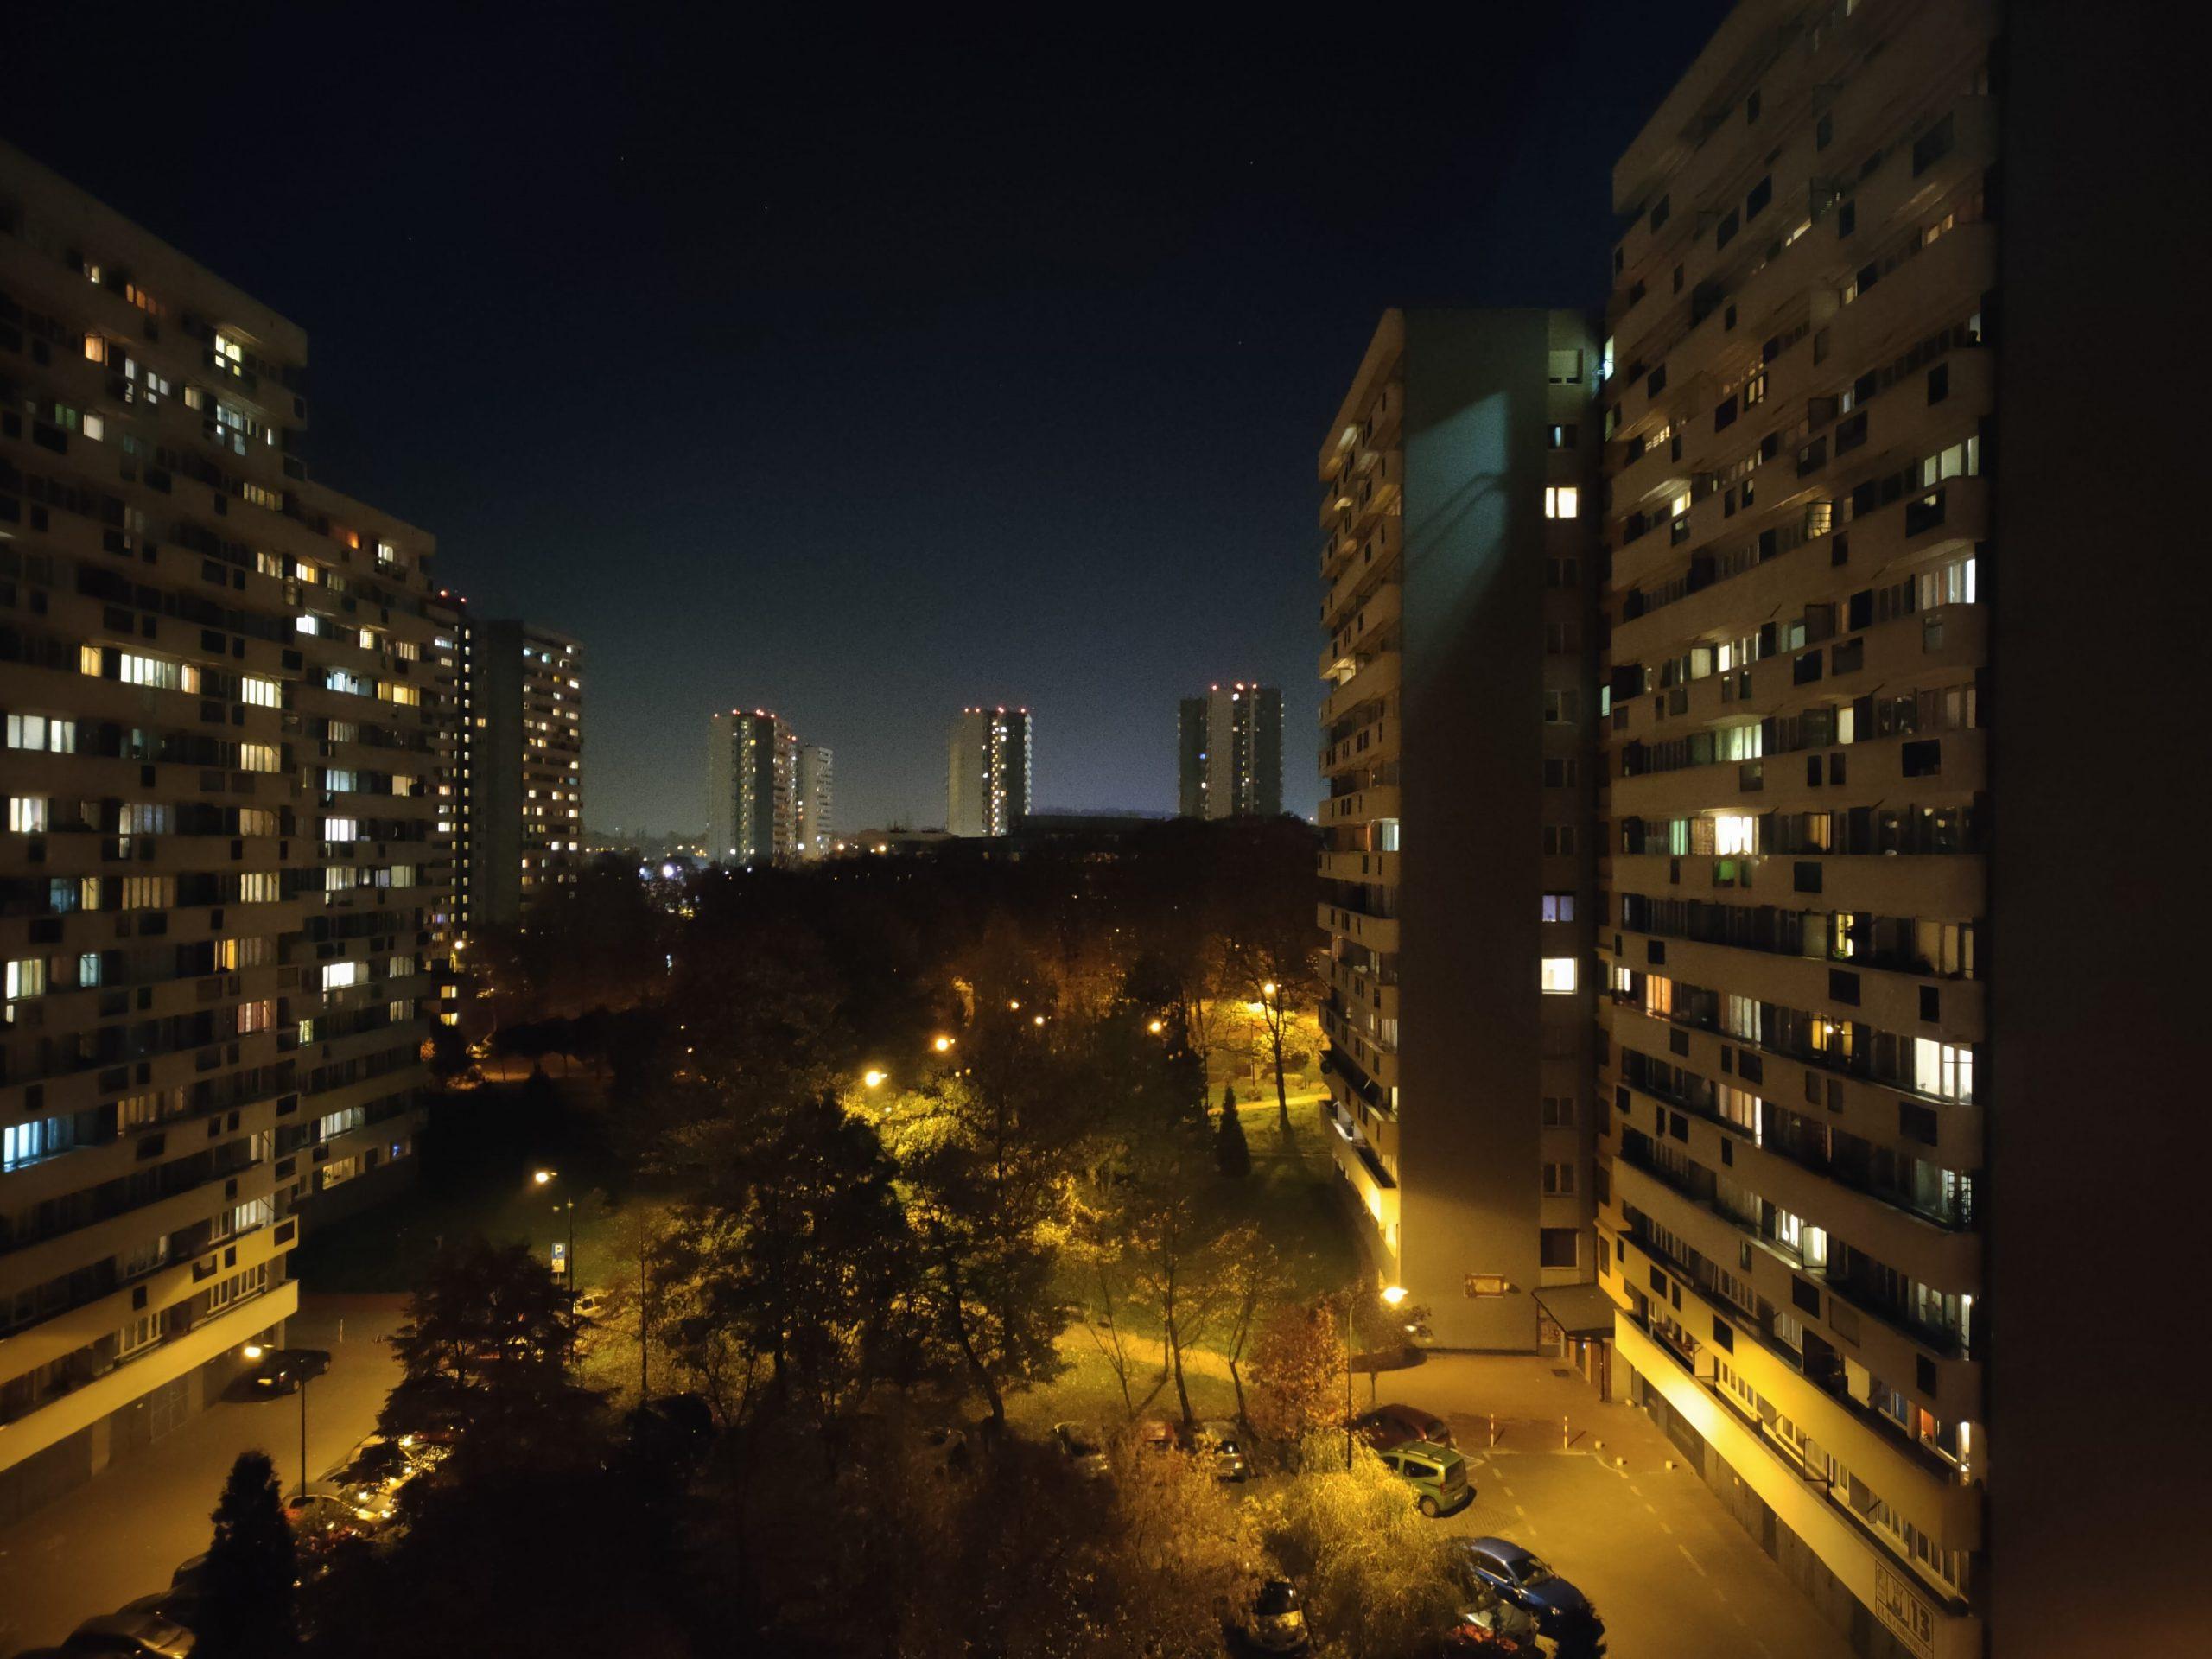 Zdjęcia nocne - realme 7 Pro